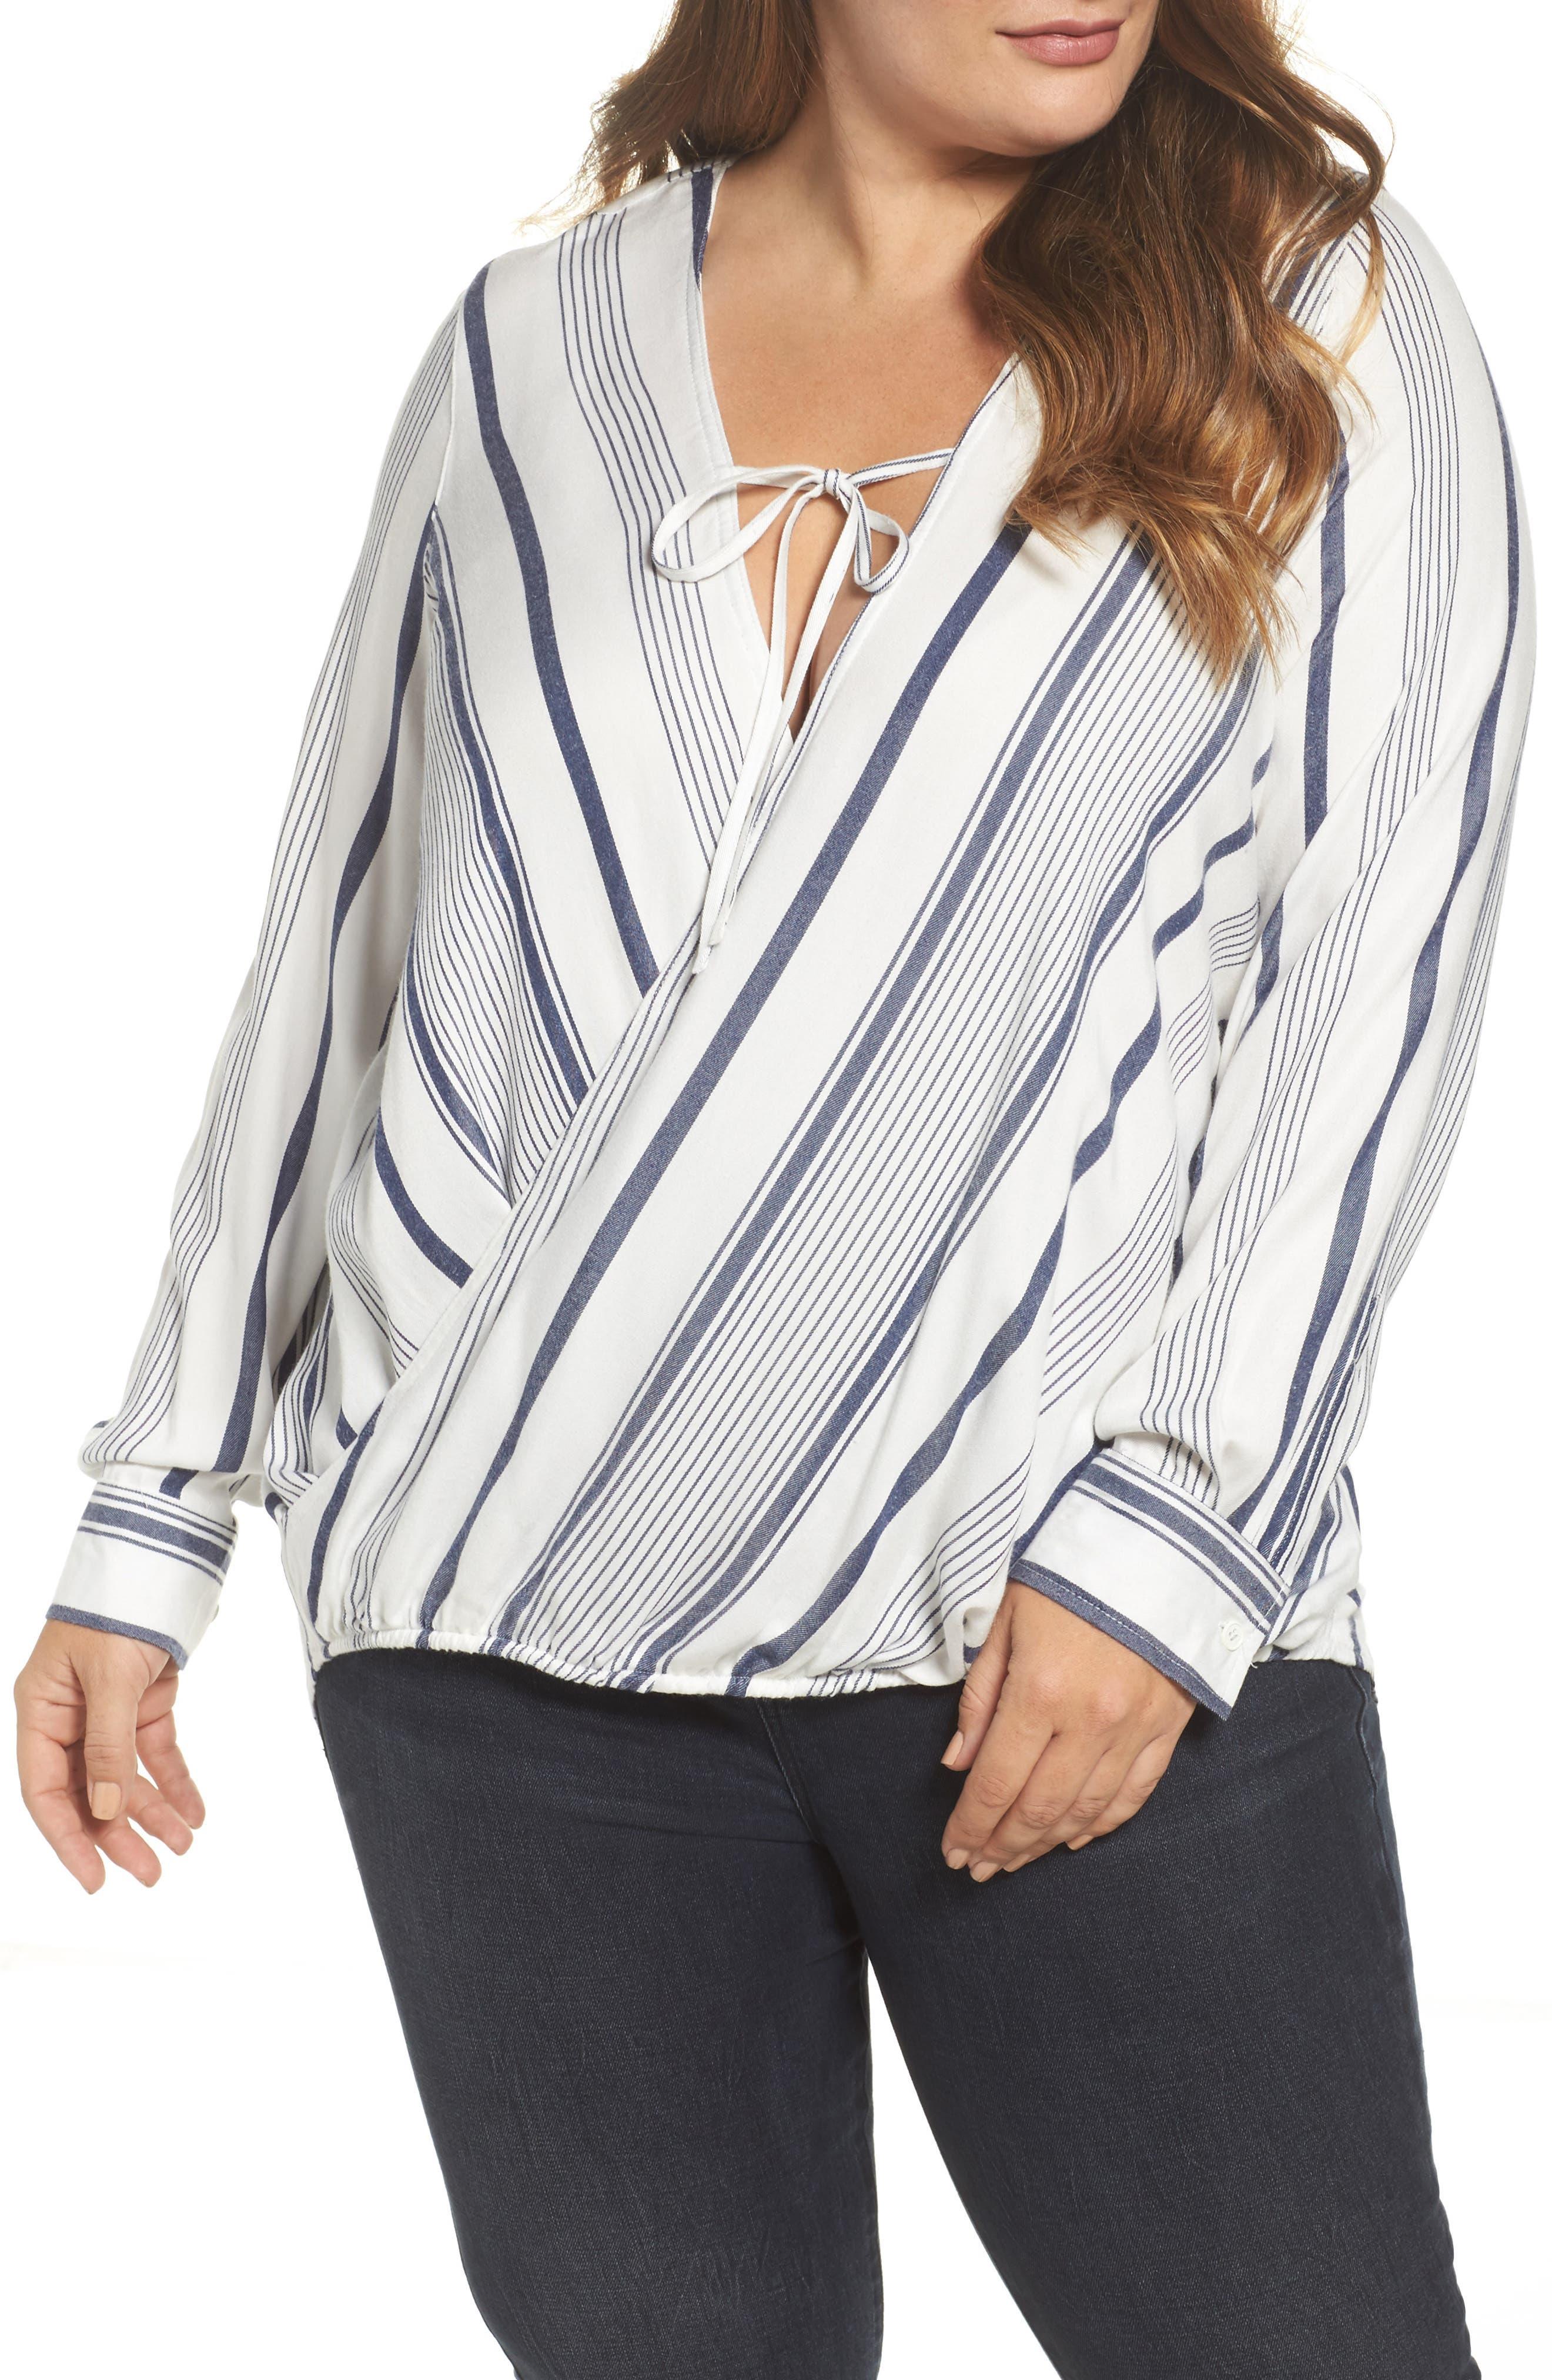 Alternate Image 1 Selected - Melissa McCarthy Seven7 Stripe Surplice Top (Plus Size)